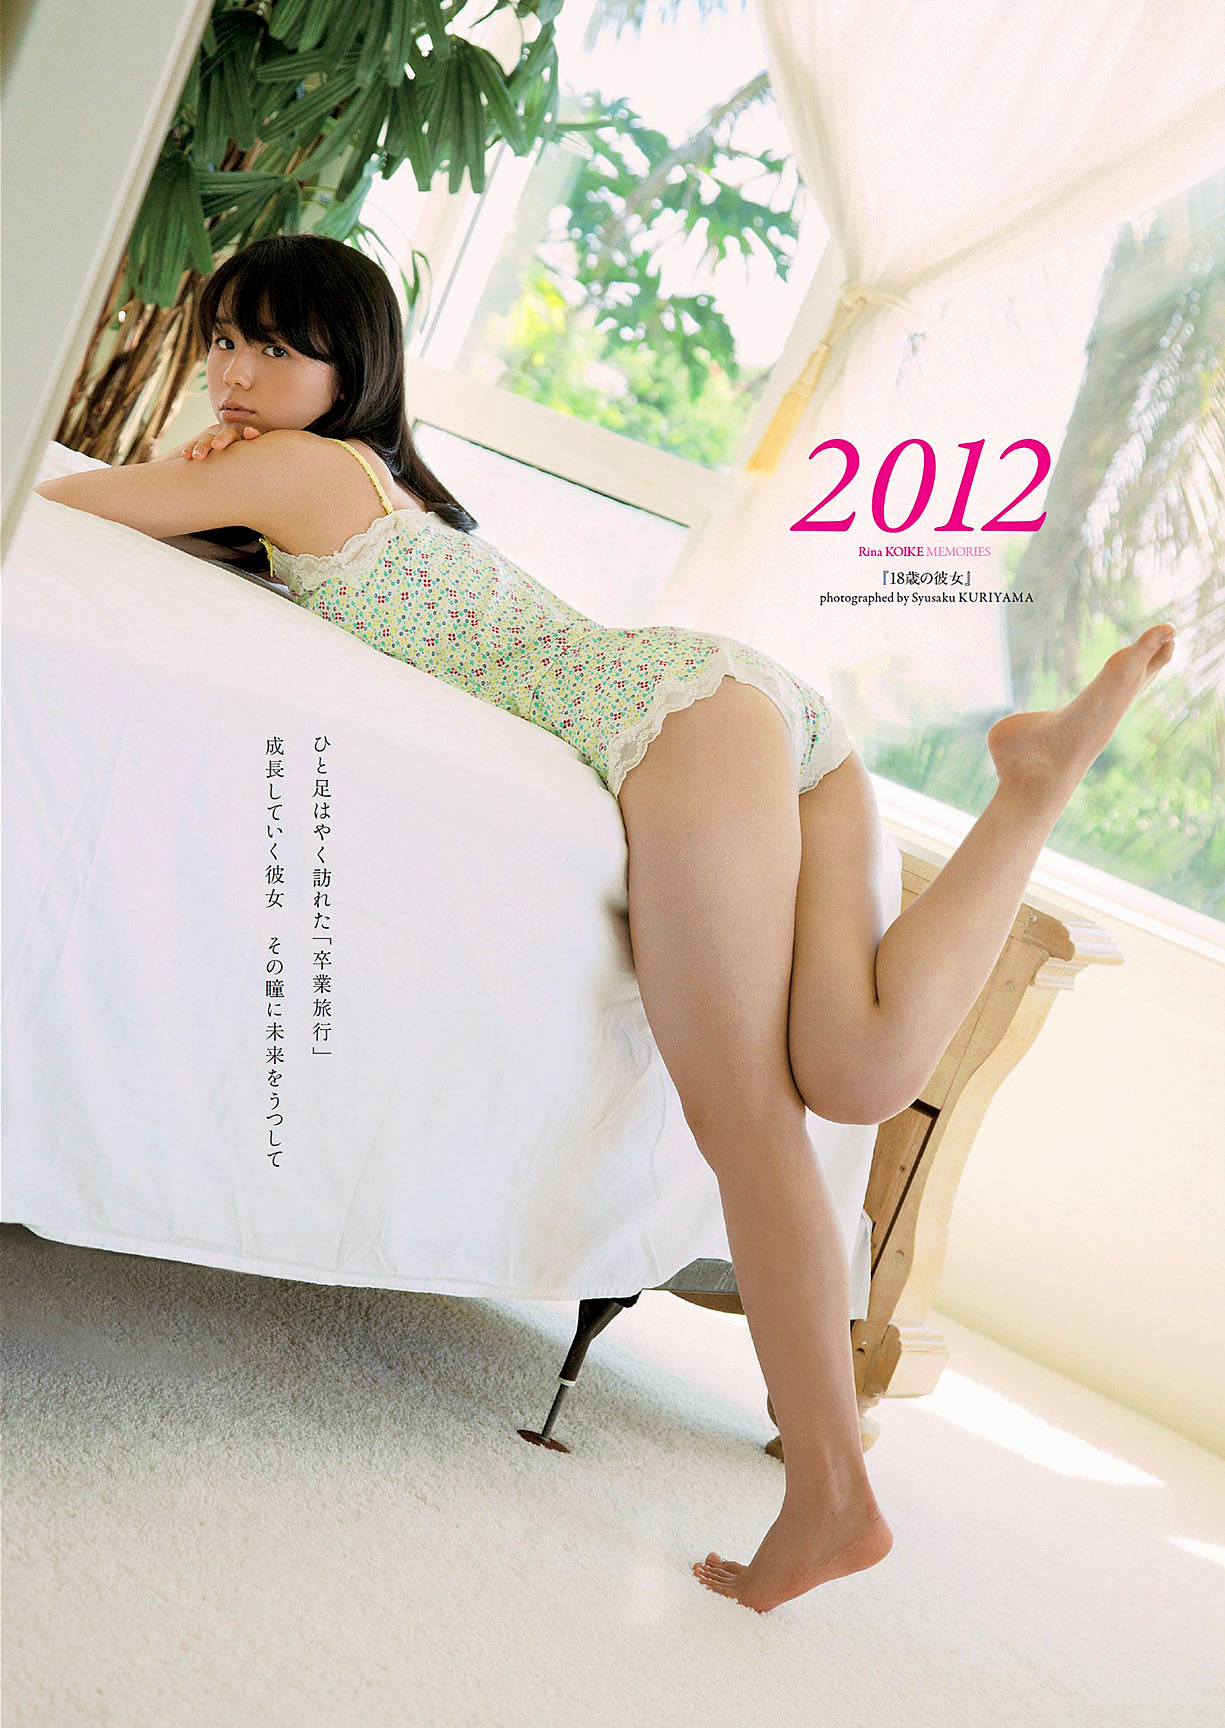 Rina Koike WPB 210111 03.jpg